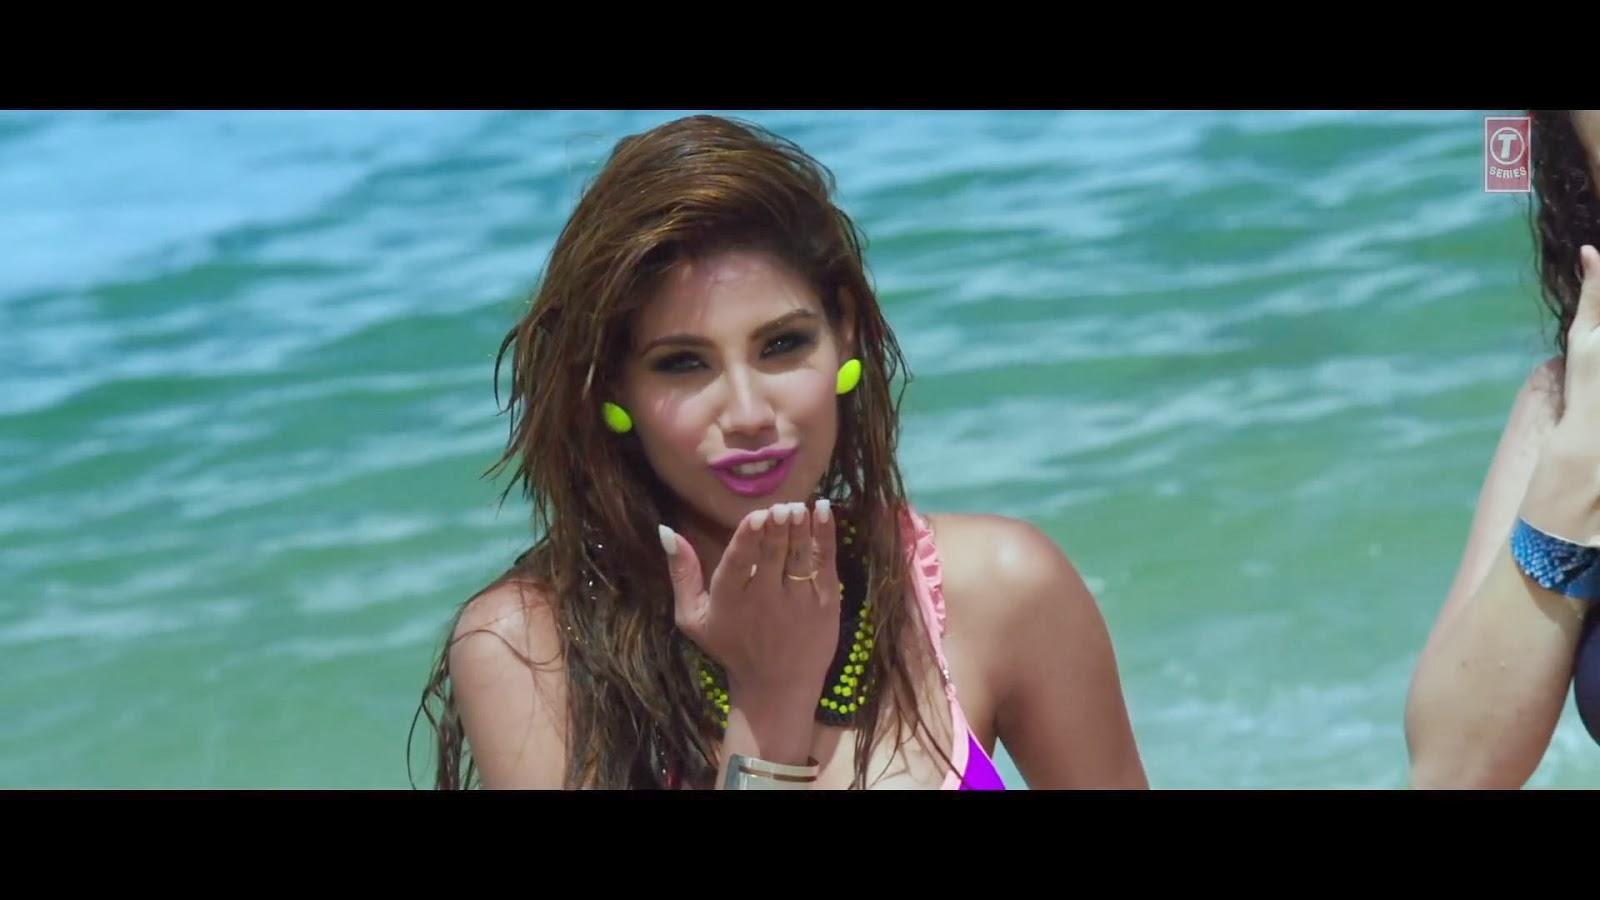 Download Sunny Sunny - Yaariyan (2014) MP3 Ringtones ...